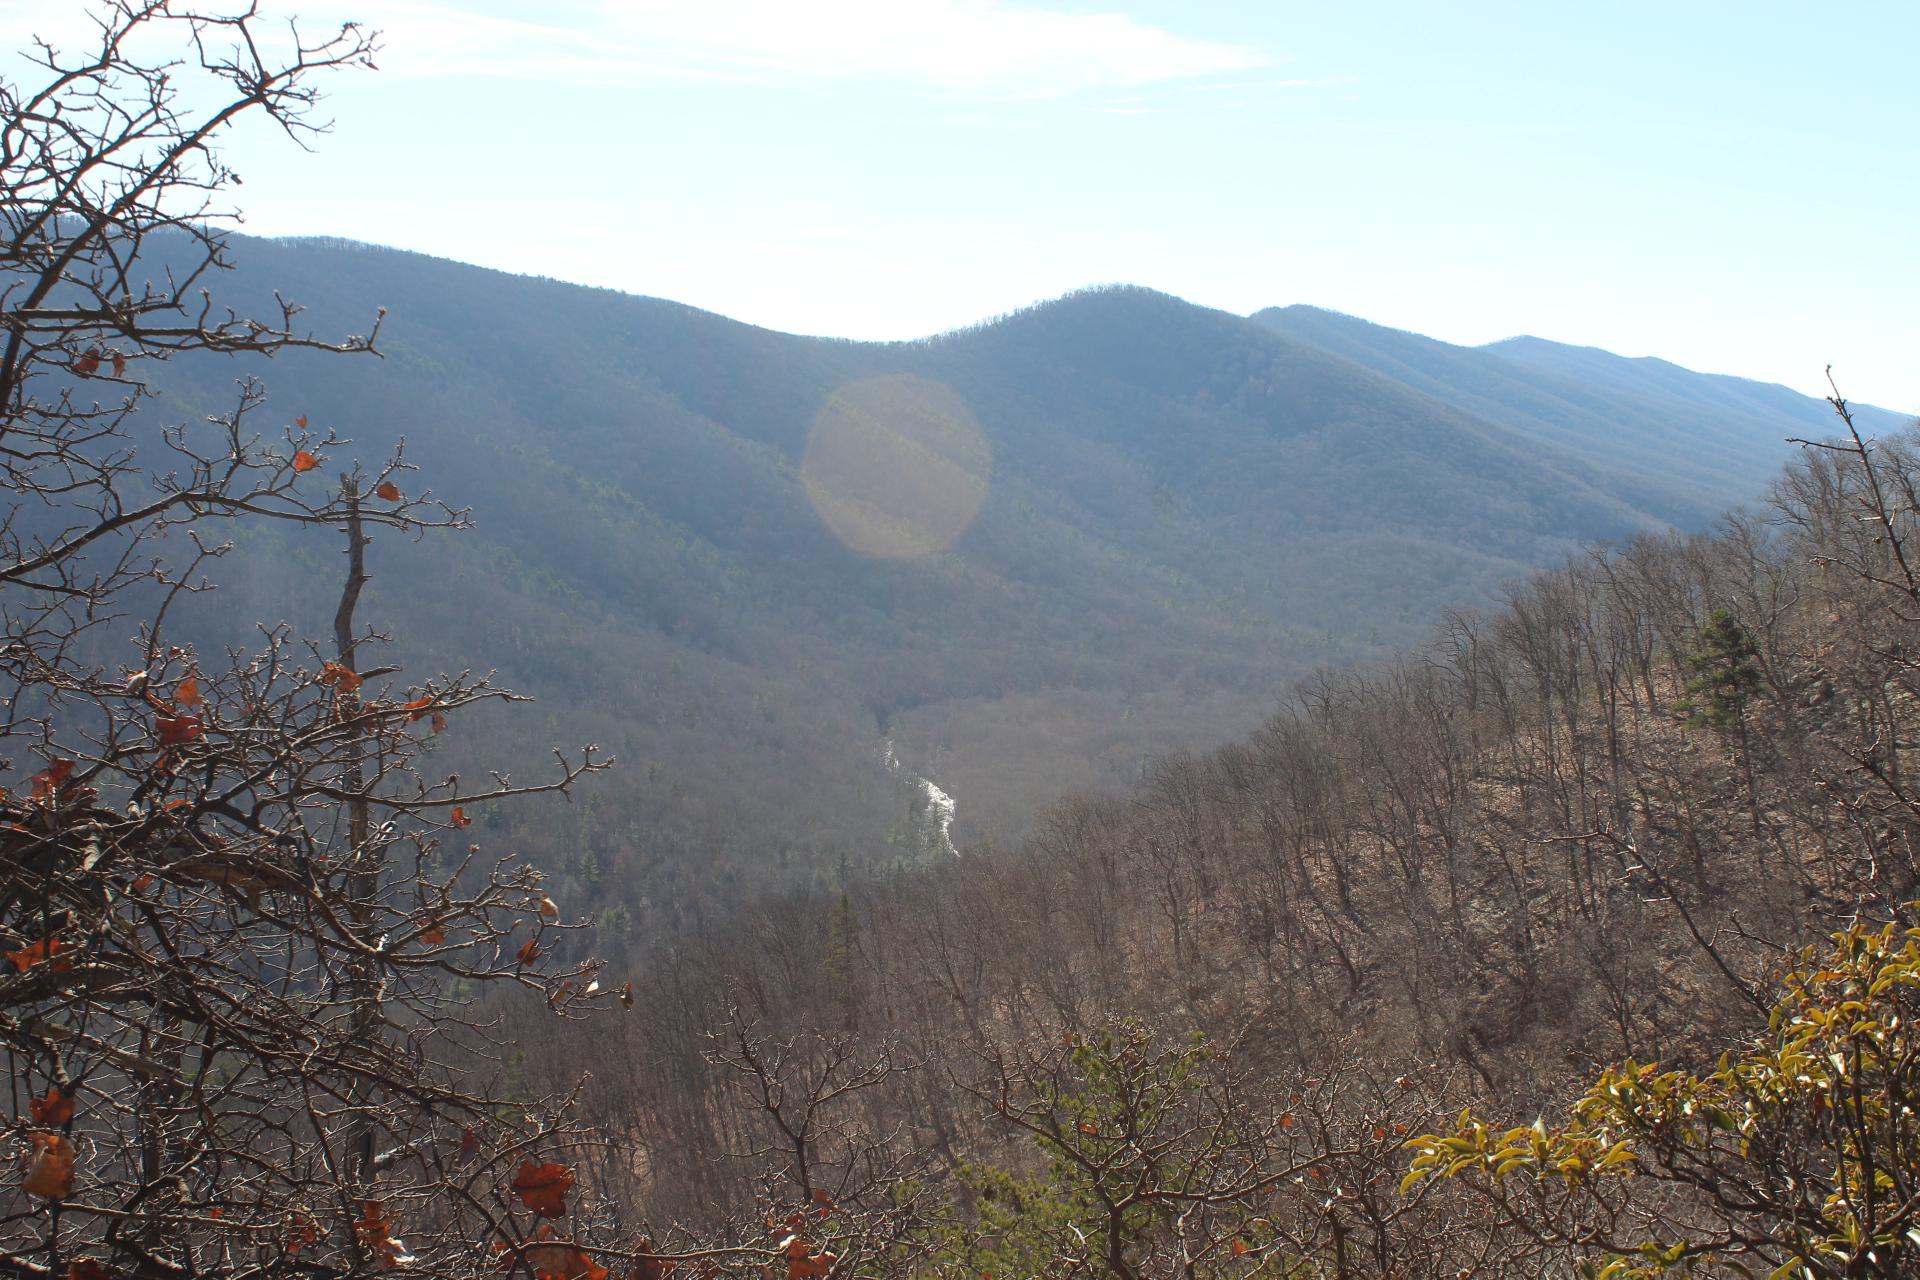 Mountains across the Ravine